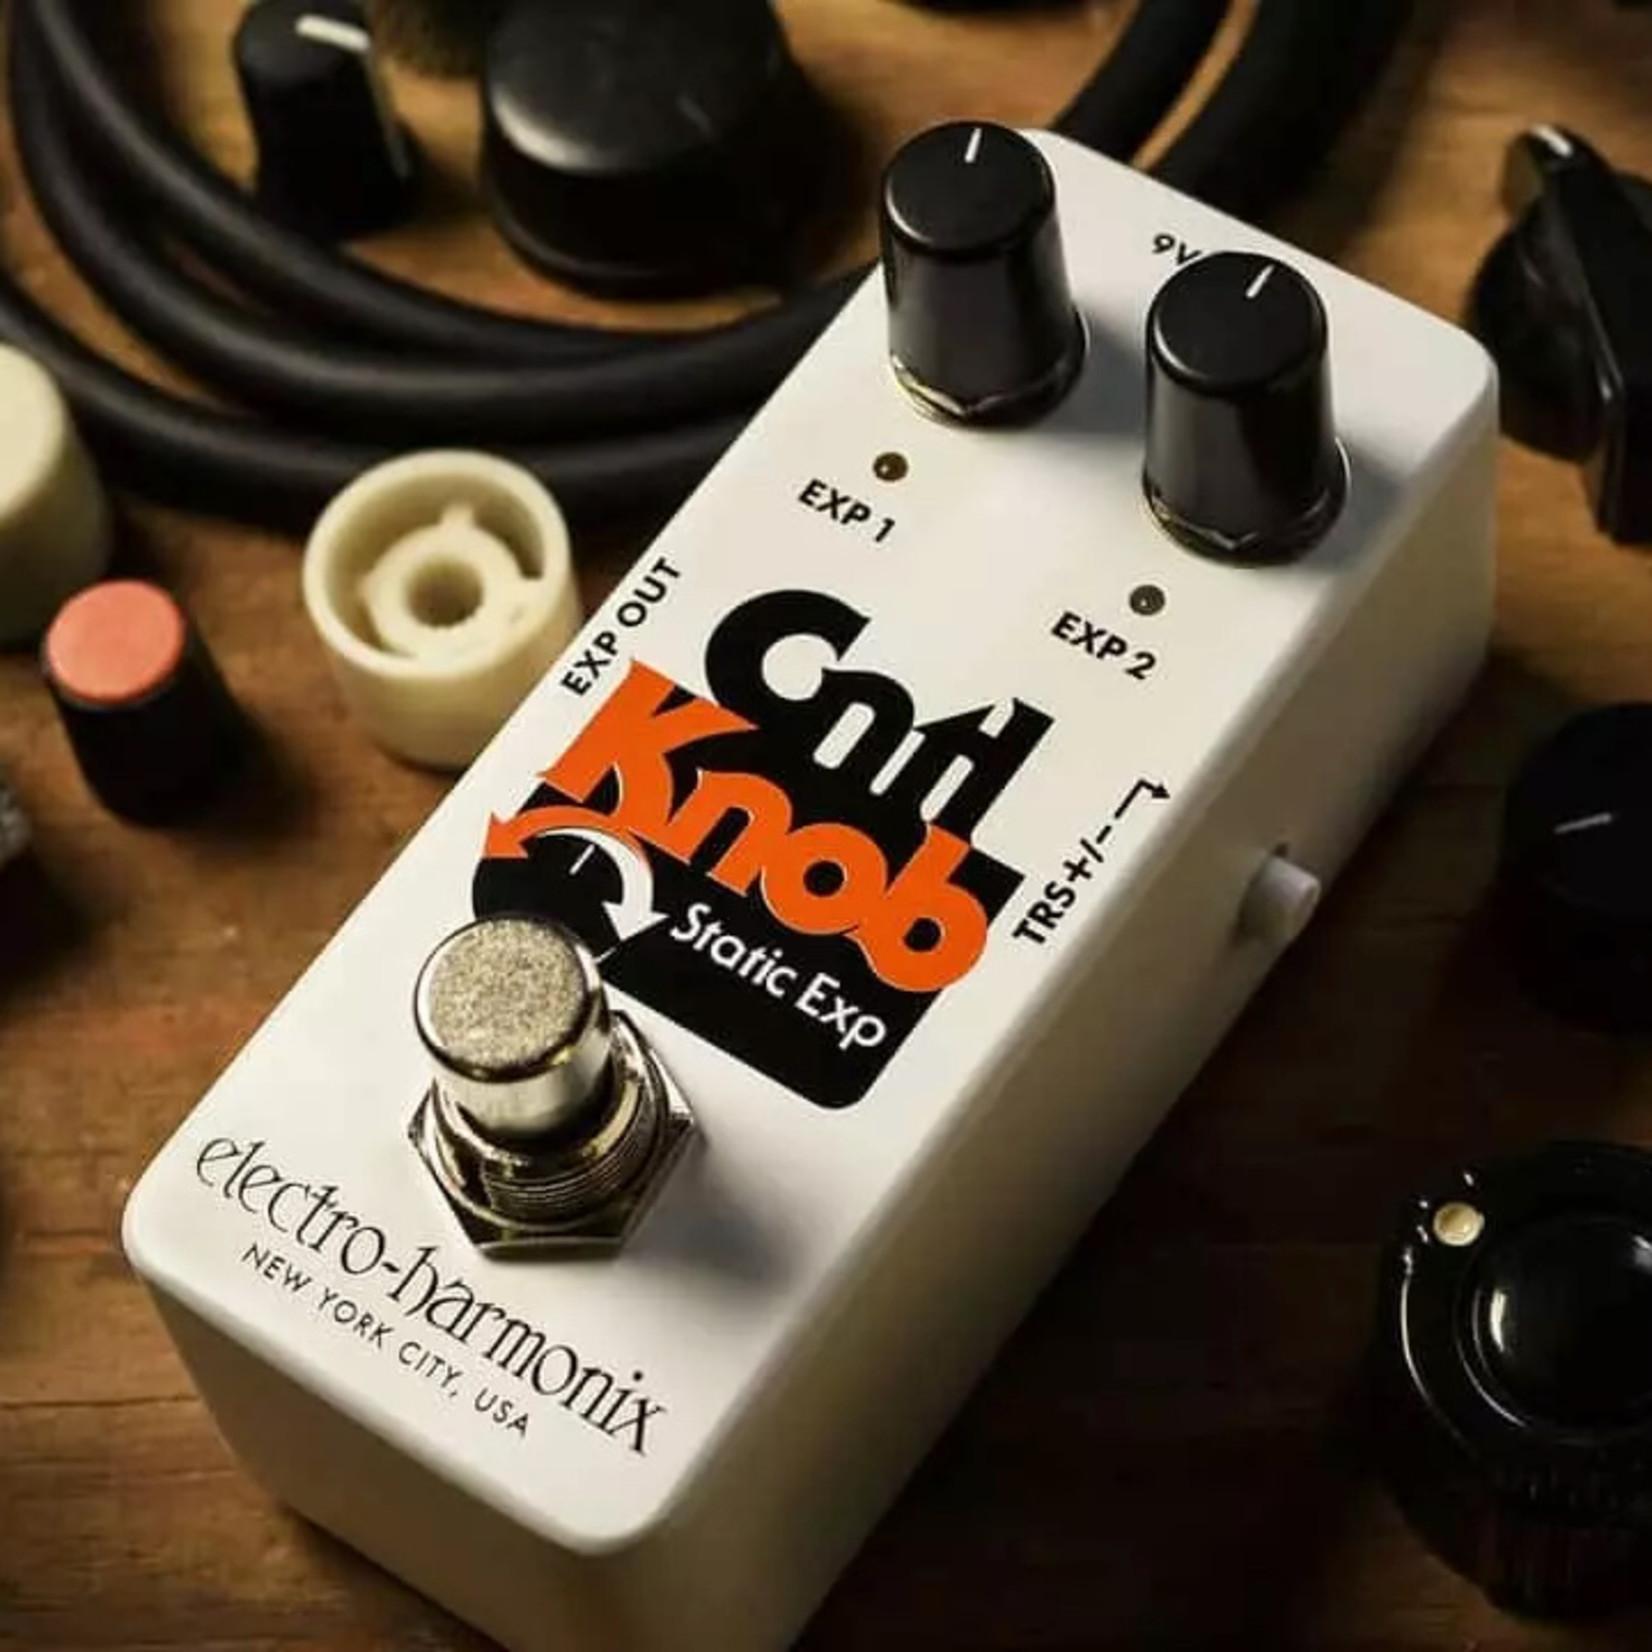 Electro-Harmonix Electro-Harmonix Cntl Knob Static Expression Pedal